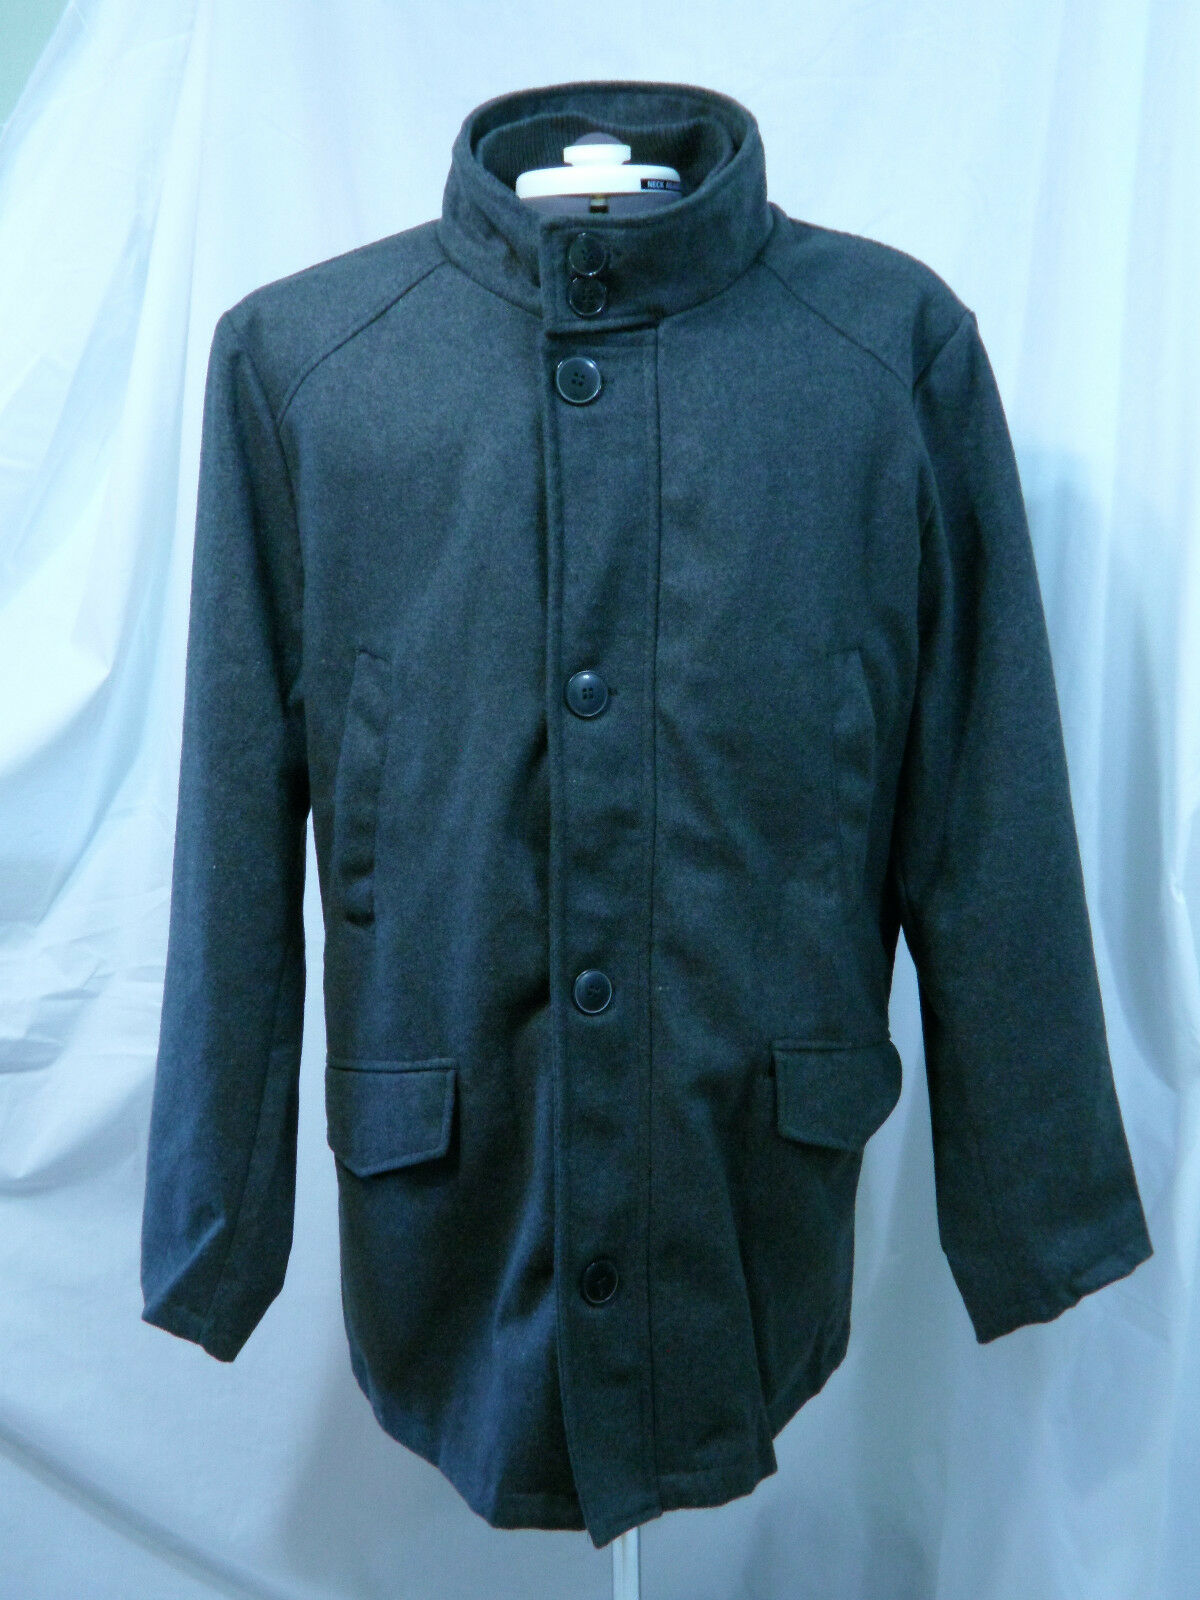 Herren Wool Blend Coat Größe YOKI NWT grau Navy Größe Coat XL New with Tags d1a476